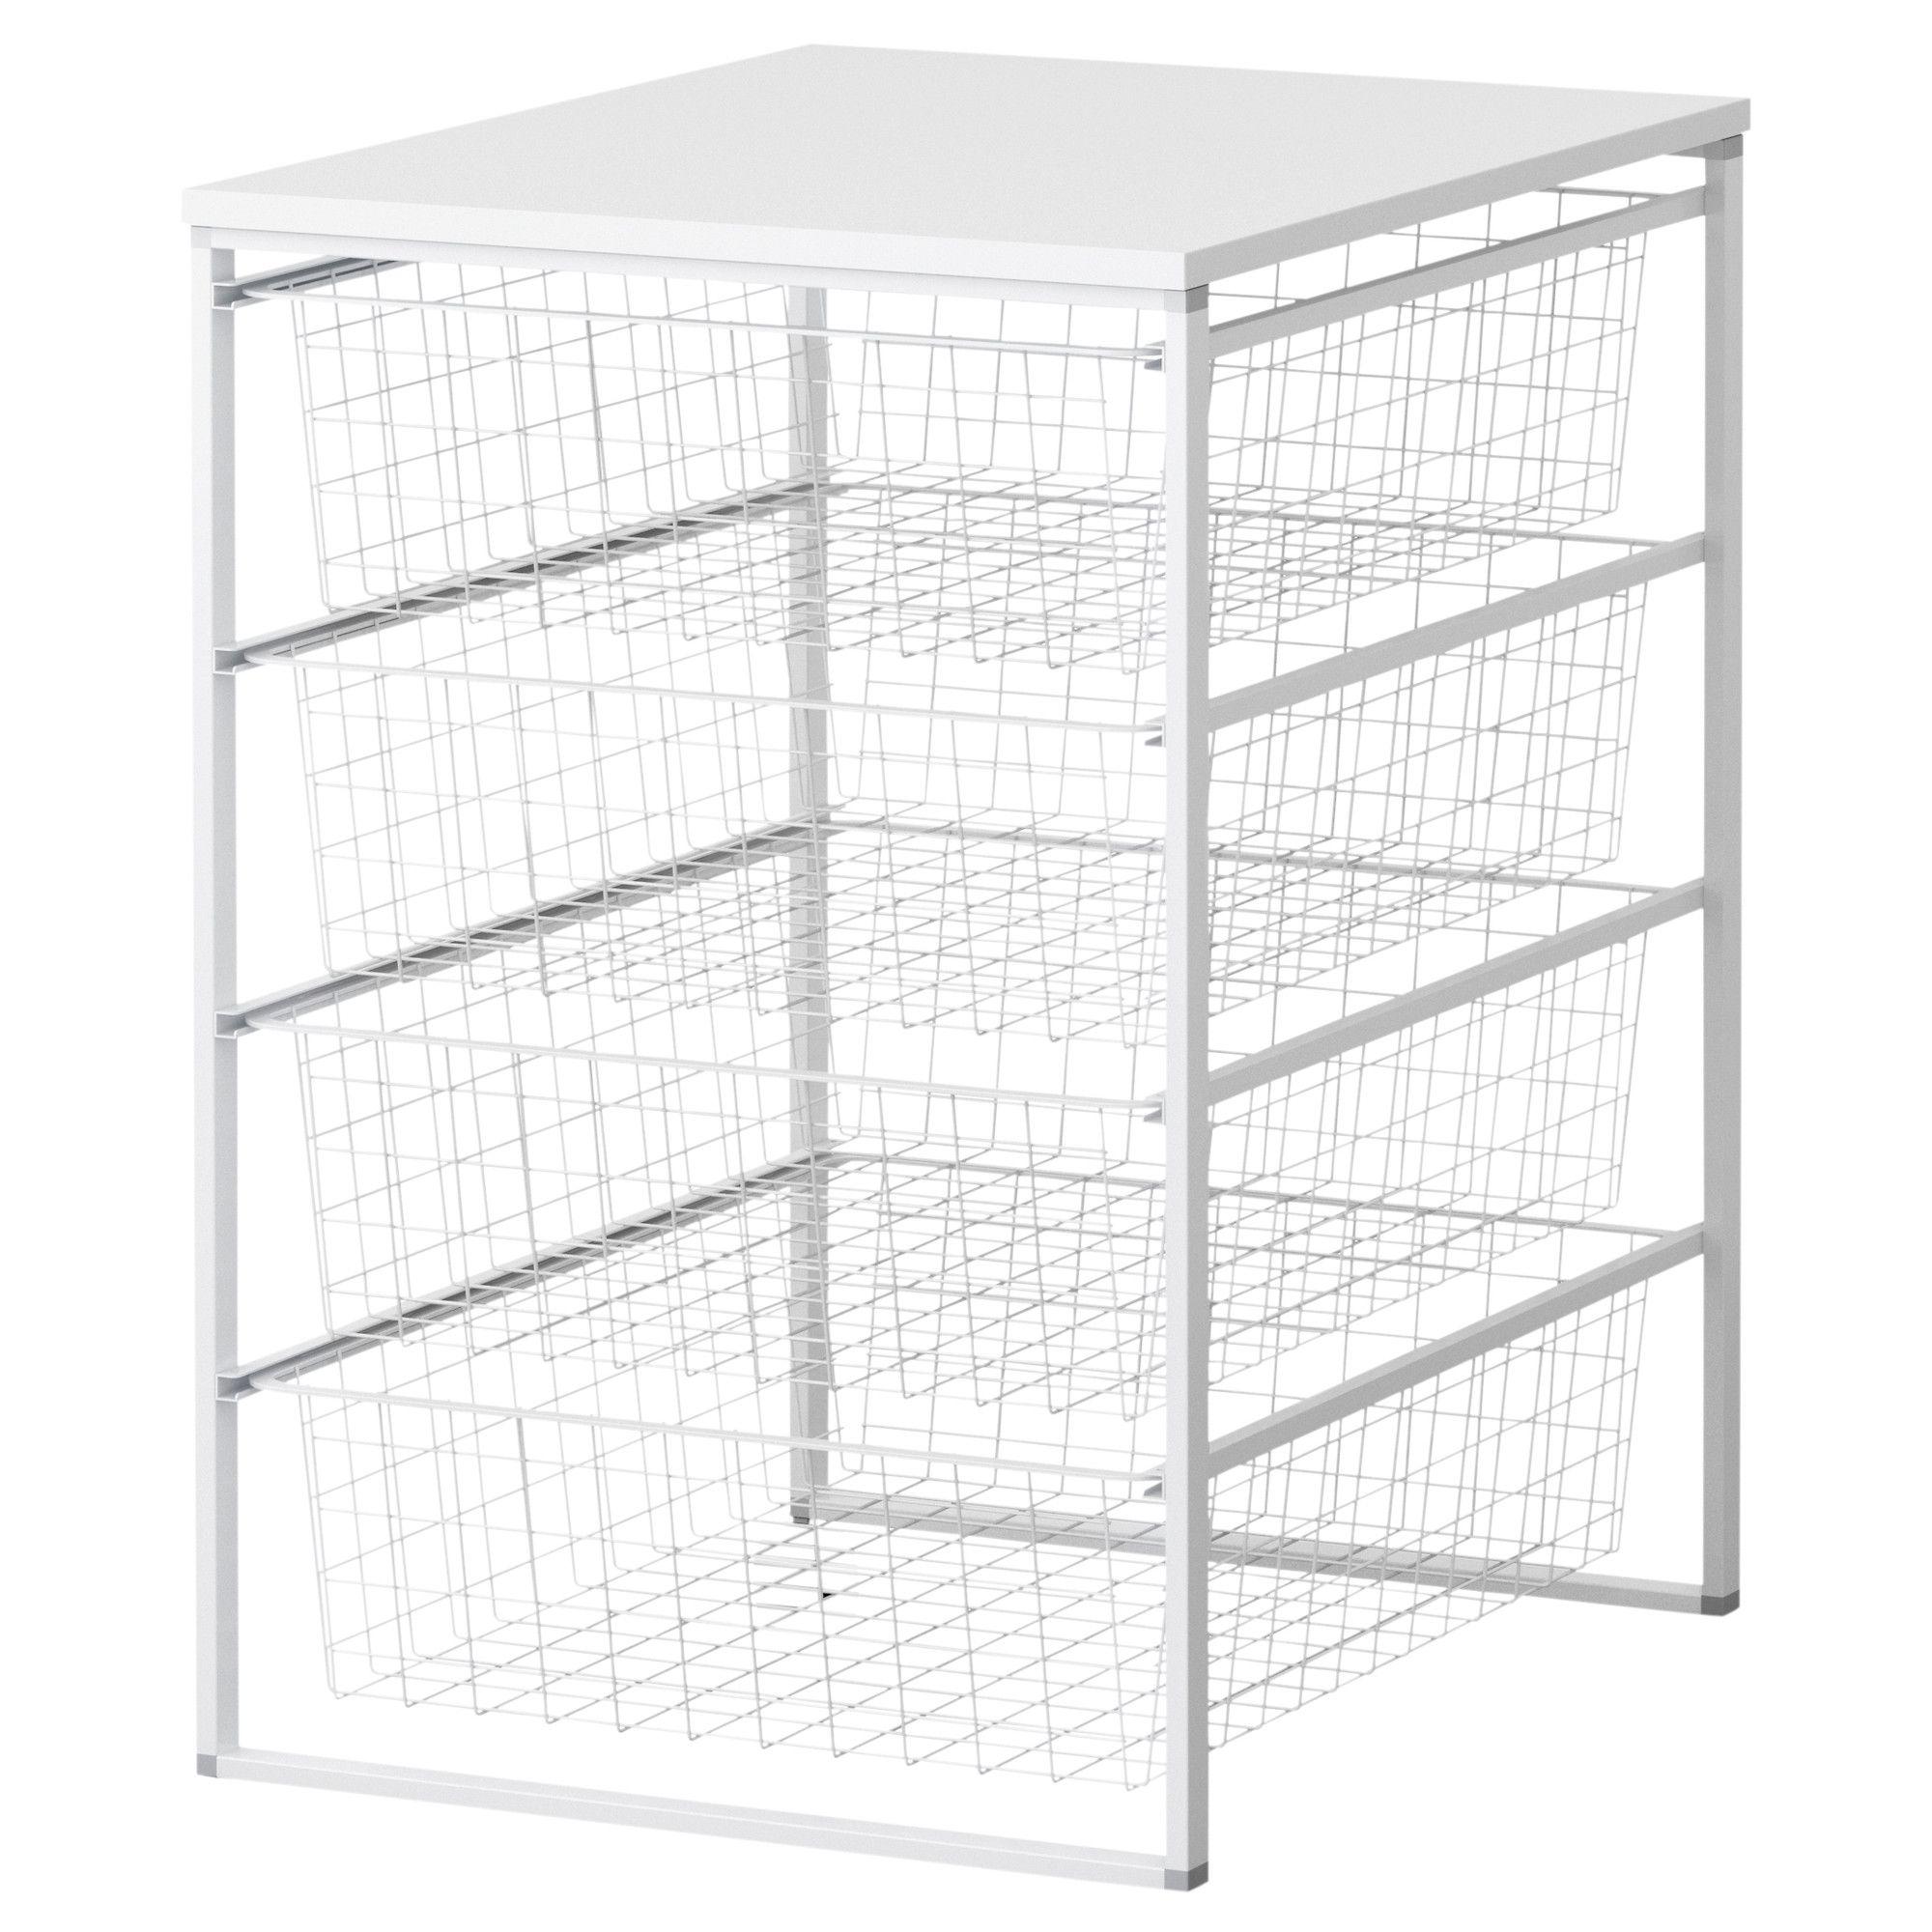 ANTONIUS Frame, Wire Baskets And Desk Top, $26.99. For Mercyu0027s Closet  Organization,